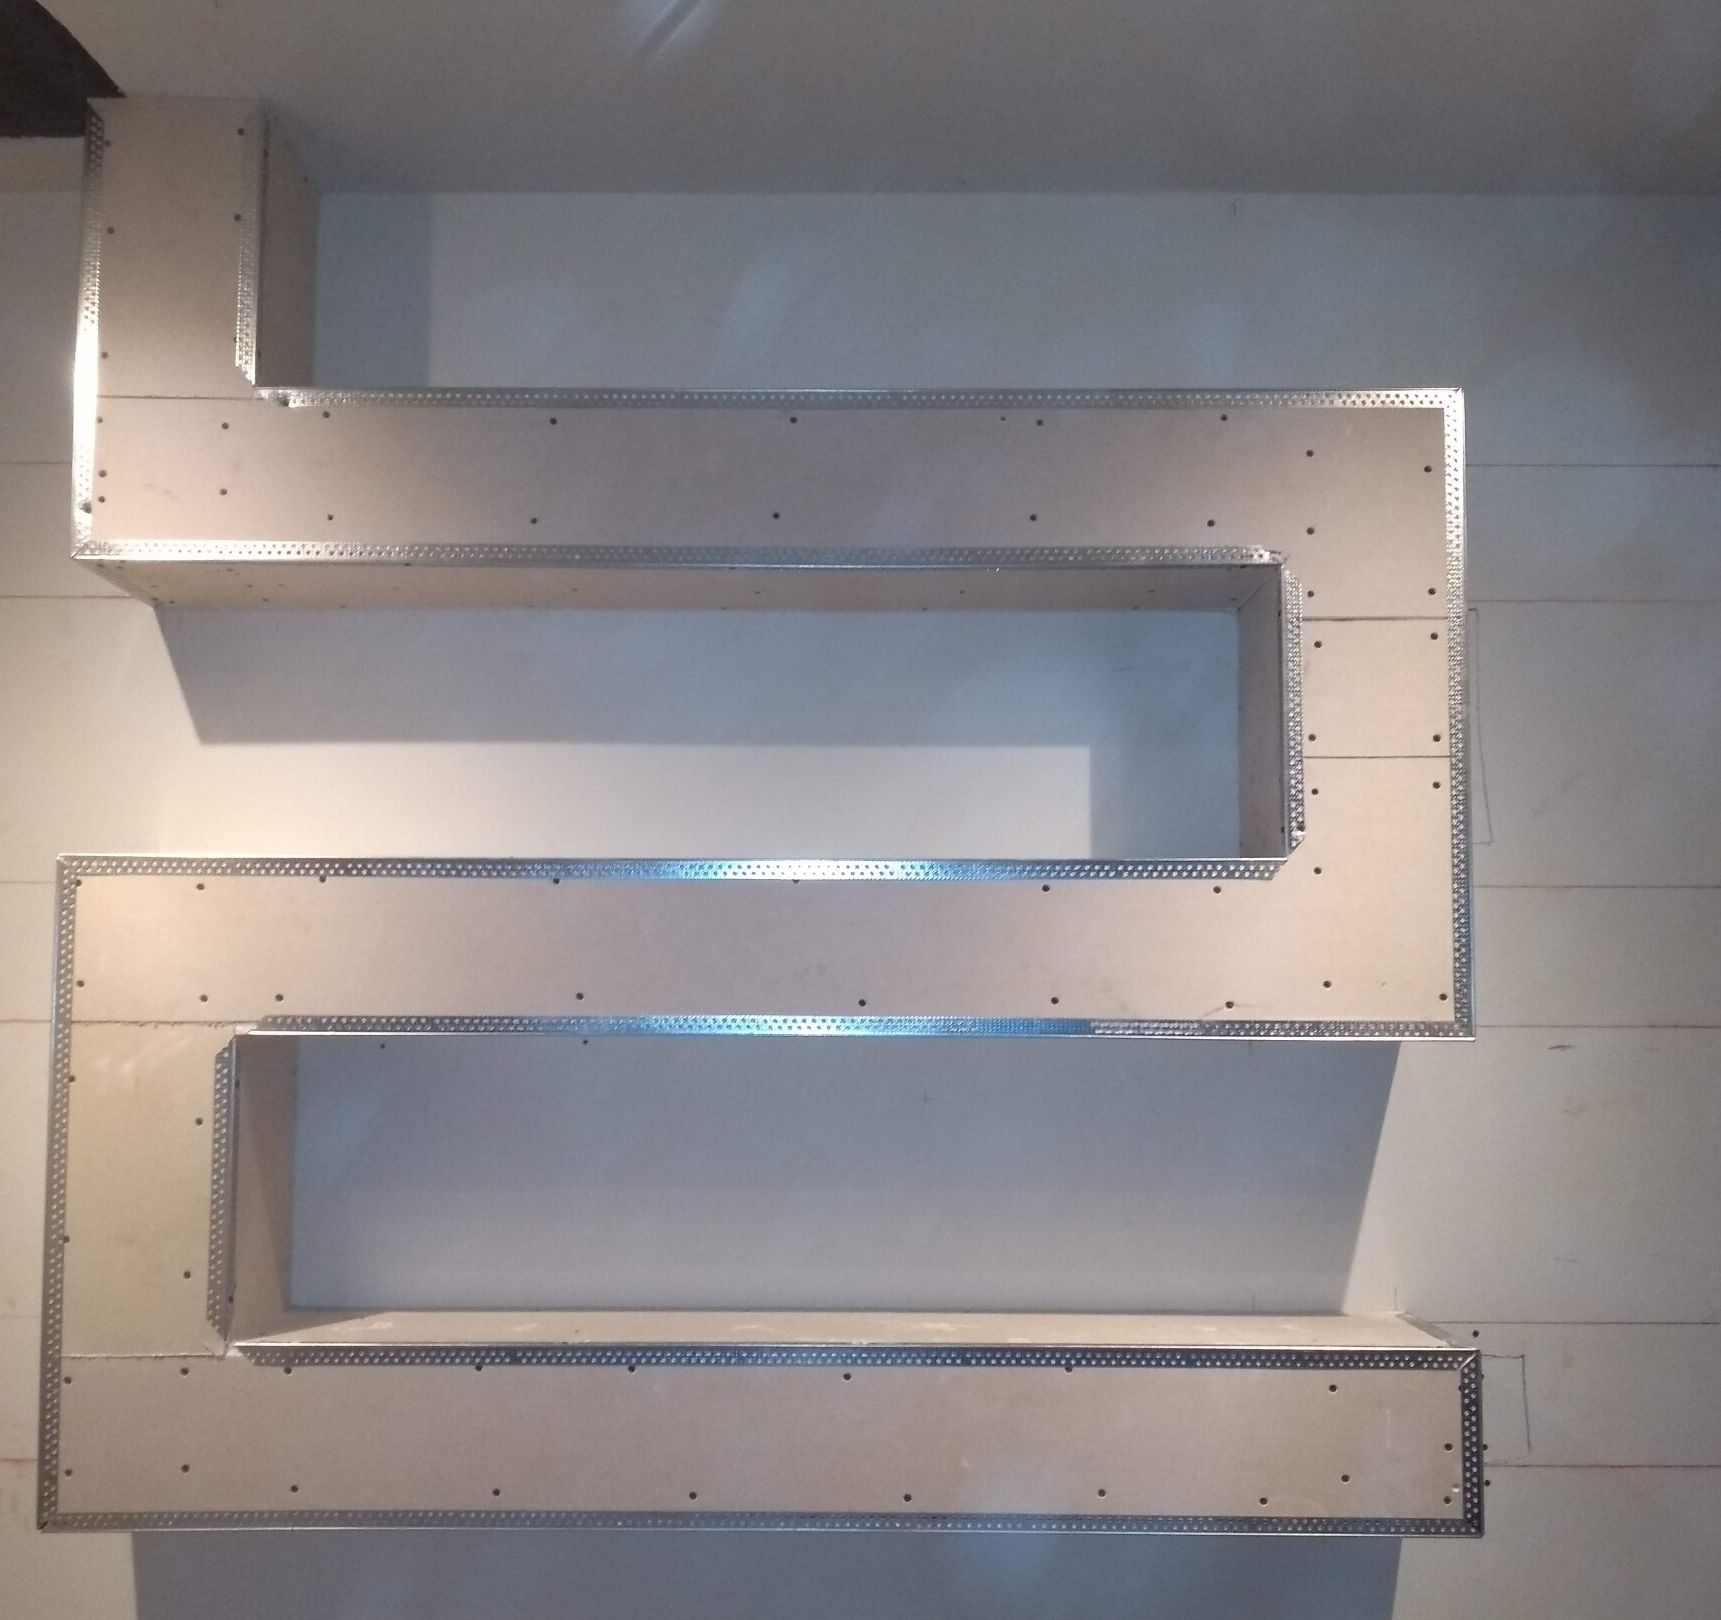 detalhes em drywall